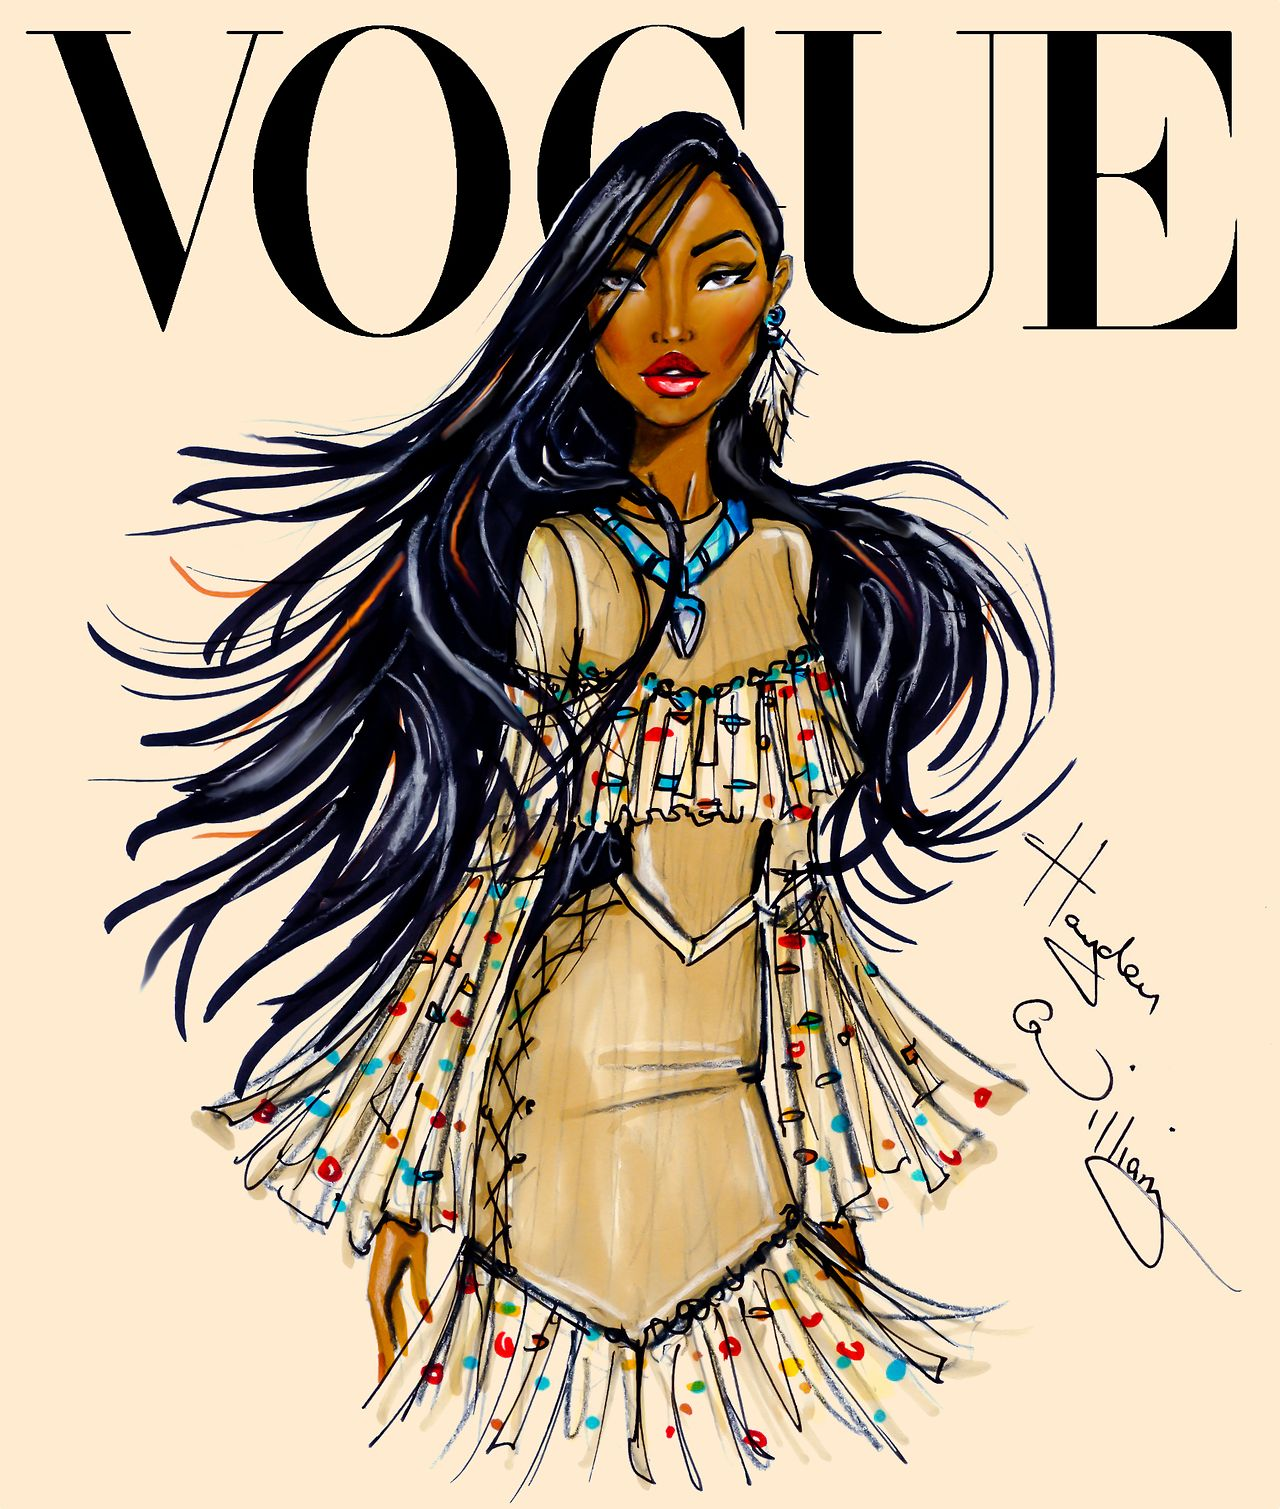 Hayden Williams Fashion Illustrations | Disney Divas for Vogue by Hayden Williams: Pocahontas